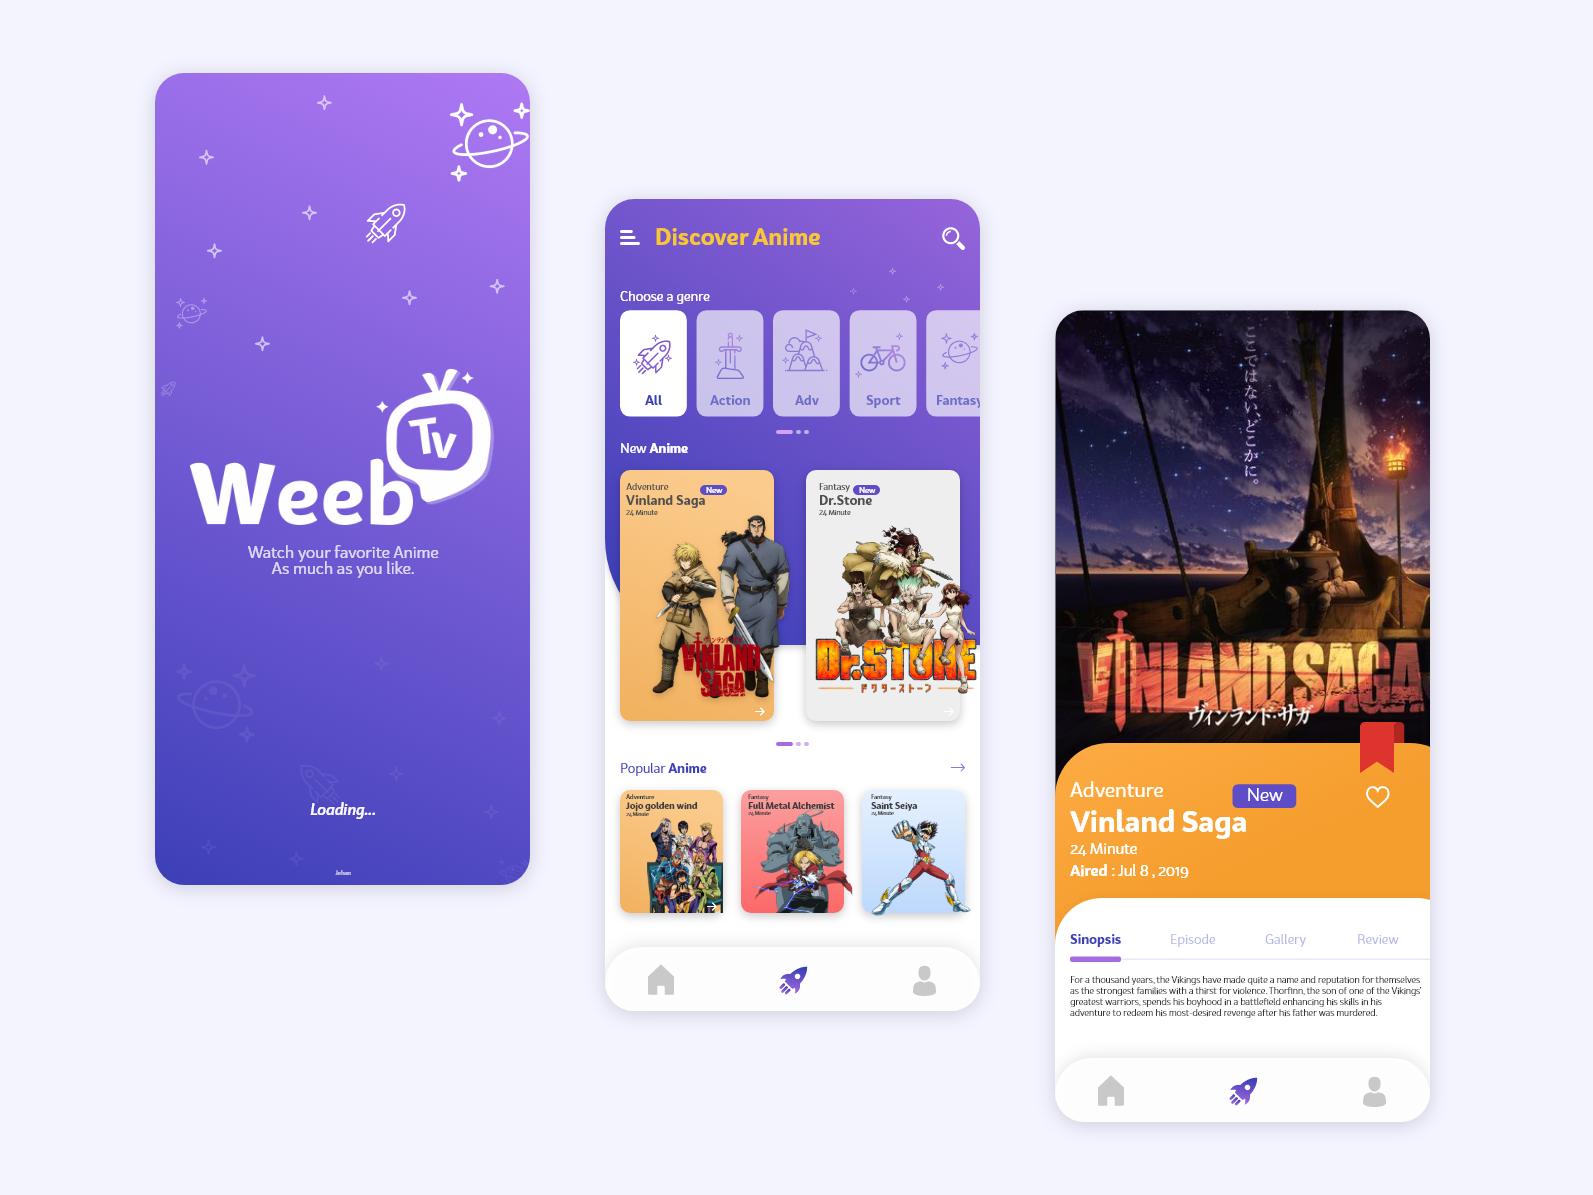 Weeb Tv - Mobile UI mobile logo anime streaming streaming app ux ui illustration design